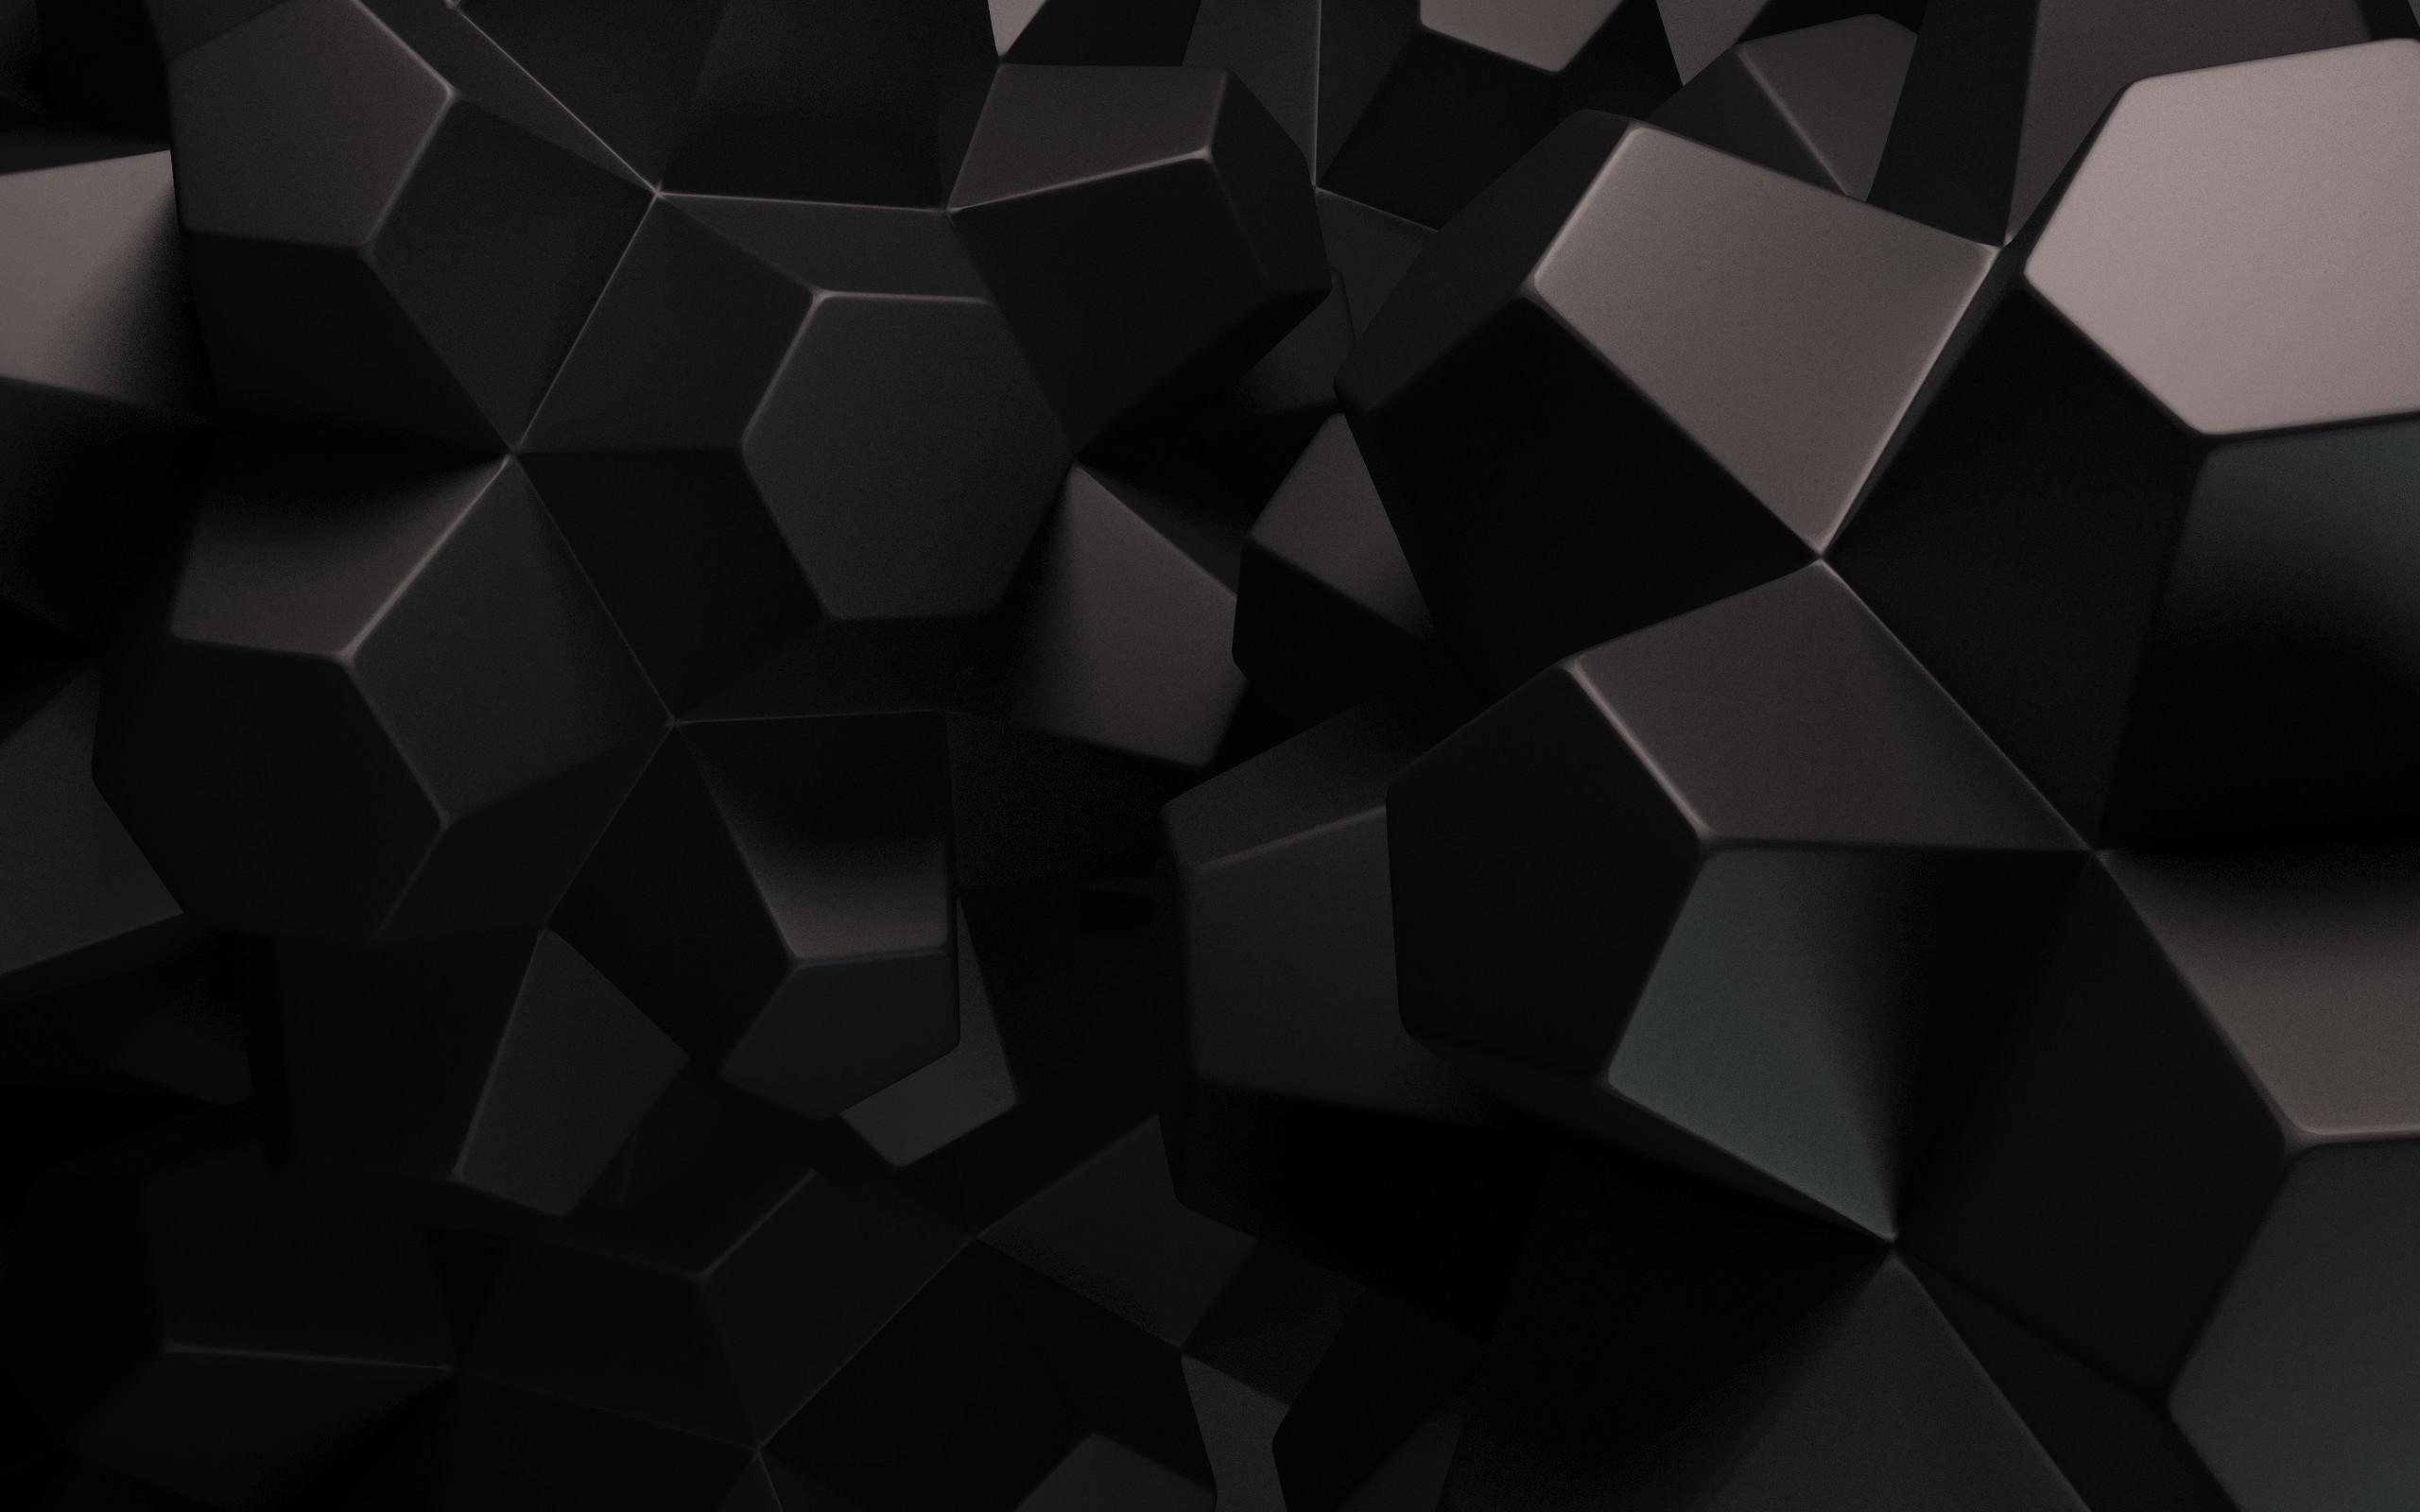 Best 10+ Black background wallpaper ideas on Pinterest   Flowers background  iphone, Red wallpaper and Floral wallpaper iphone